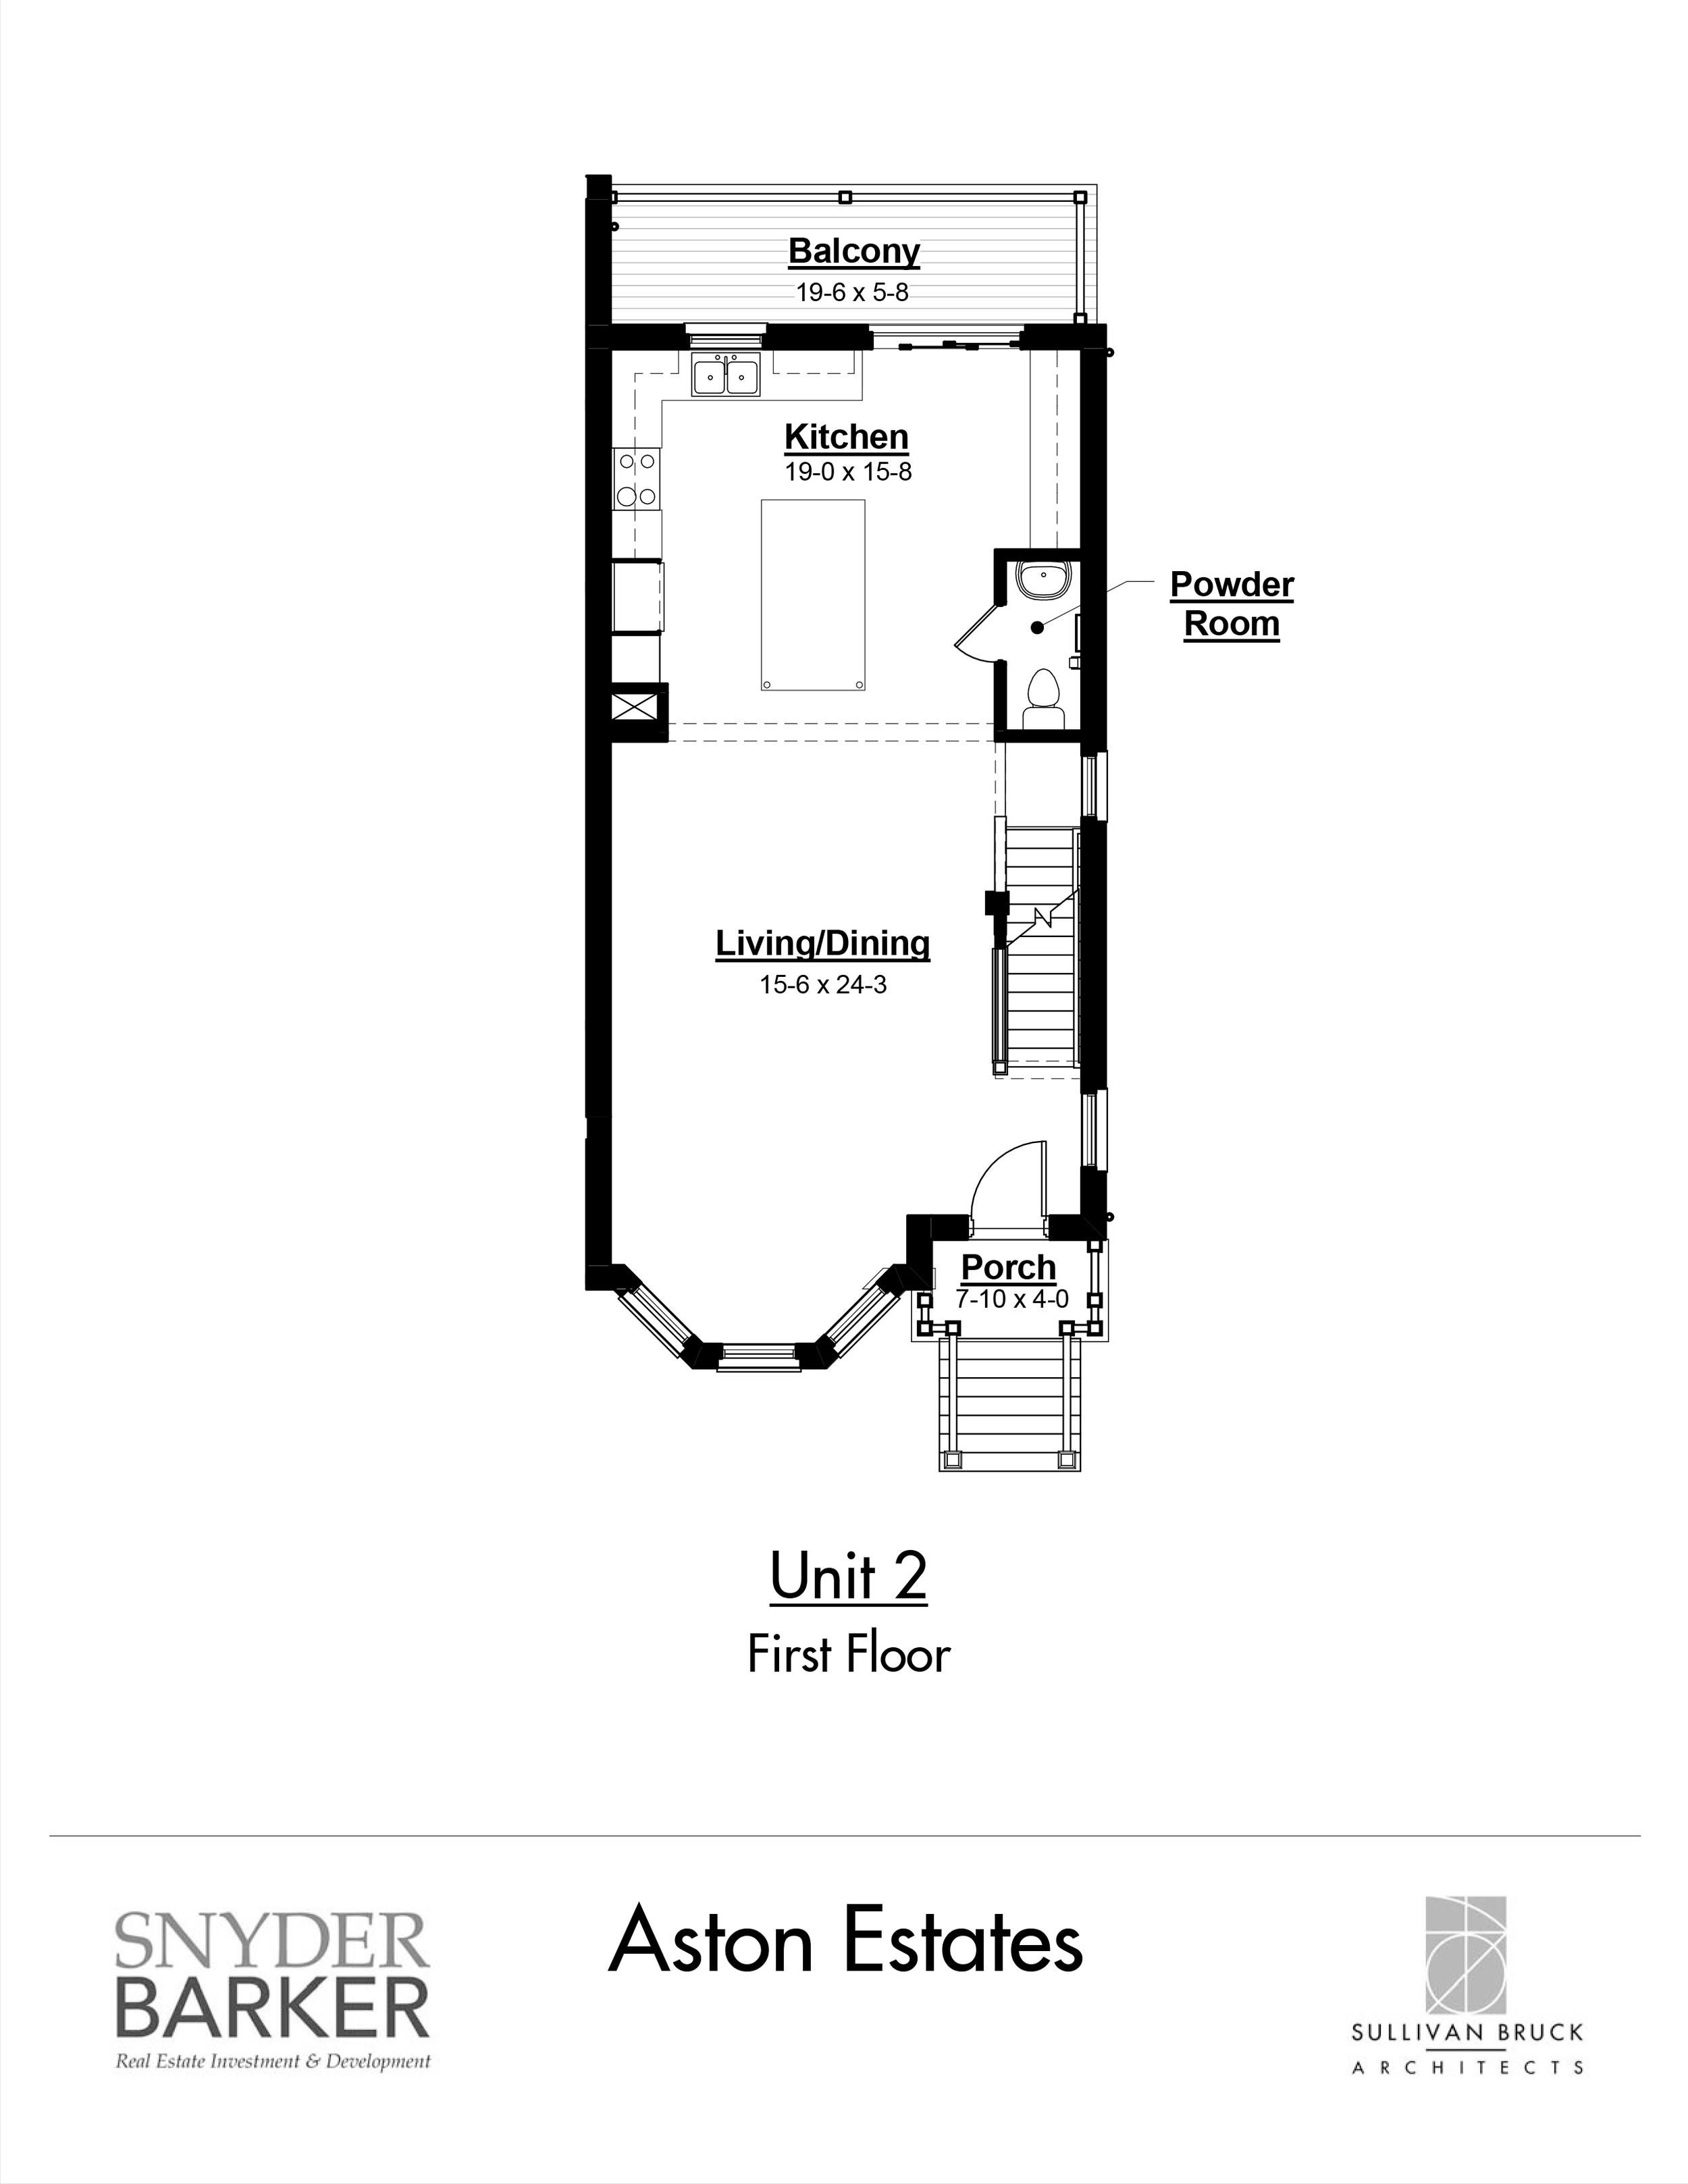 Aston_Estates_Unit_2_First_Floor.jpg